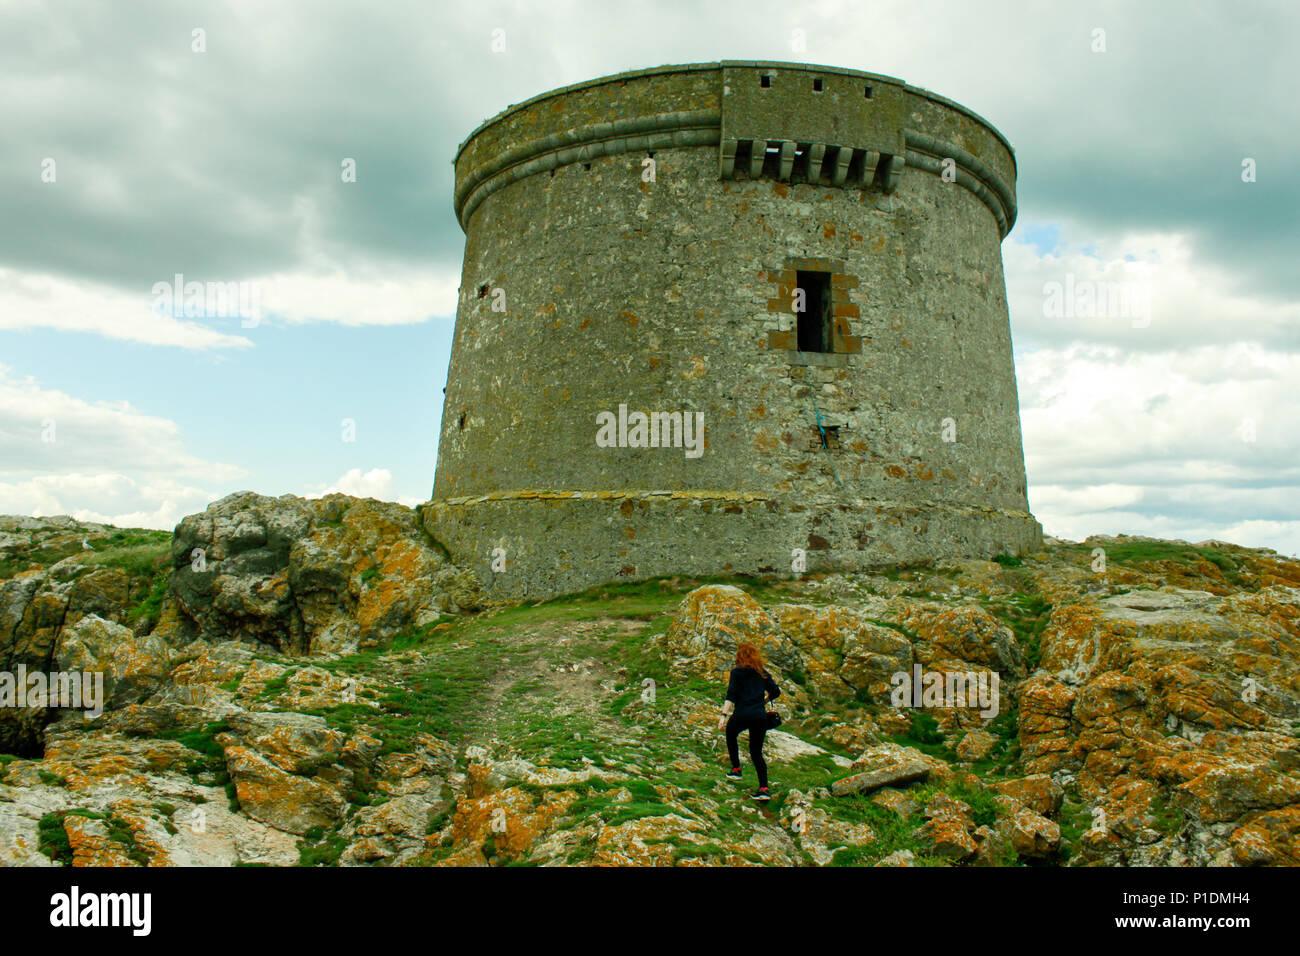 Martello tower on Ireland's Eye off the coast of Howth, Co. Dublin - Stock Image